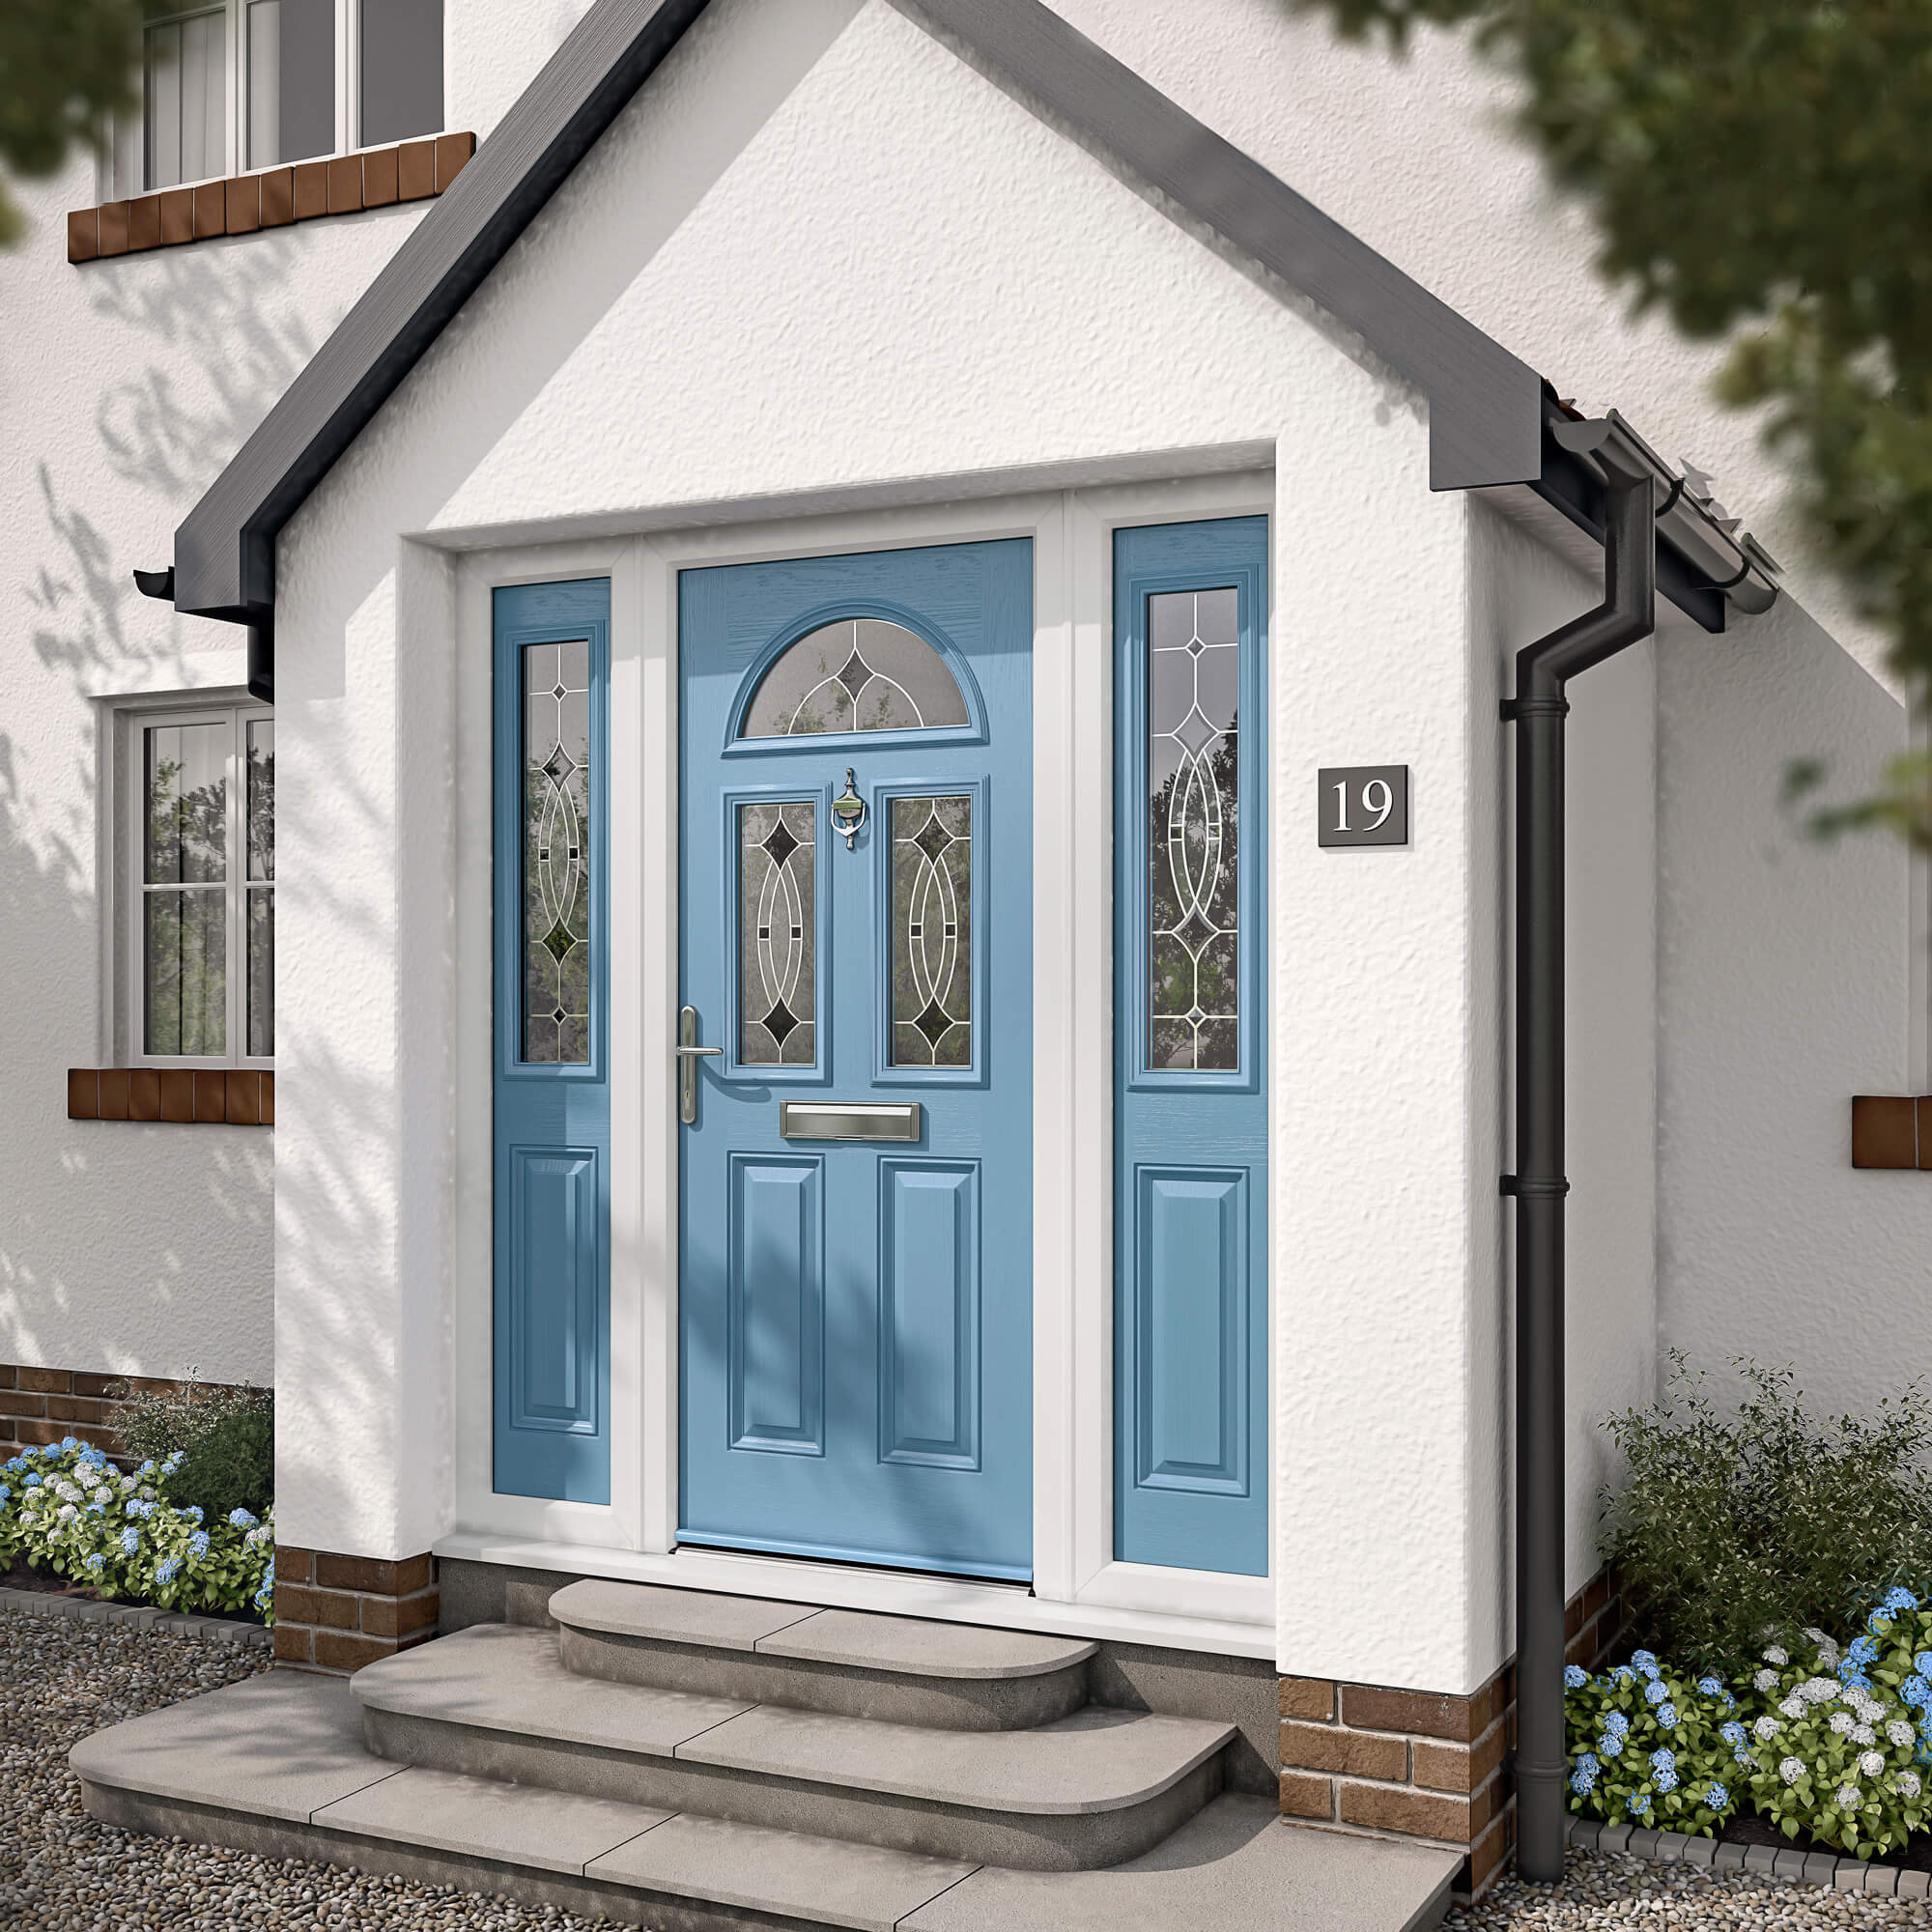 Double Glazing Doors in Ynysmaerdy